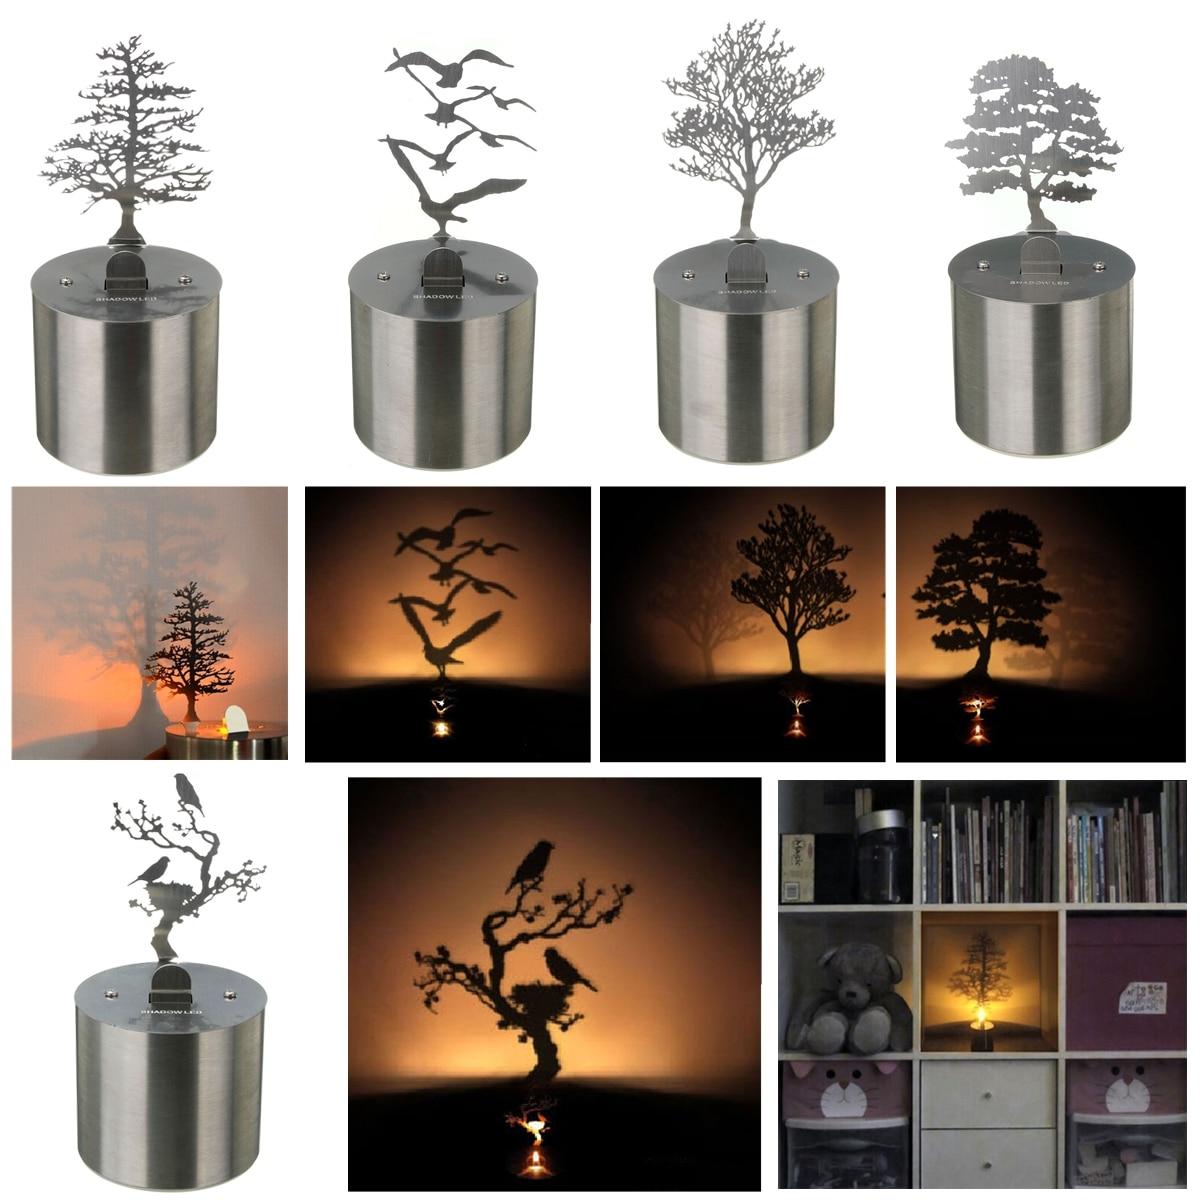 Smuxi 5 Style Shadow LED Projection Lamp Tree Night Light Romantic Atmosphere Mood Laser Novelty Lighting Desktop Home Decor